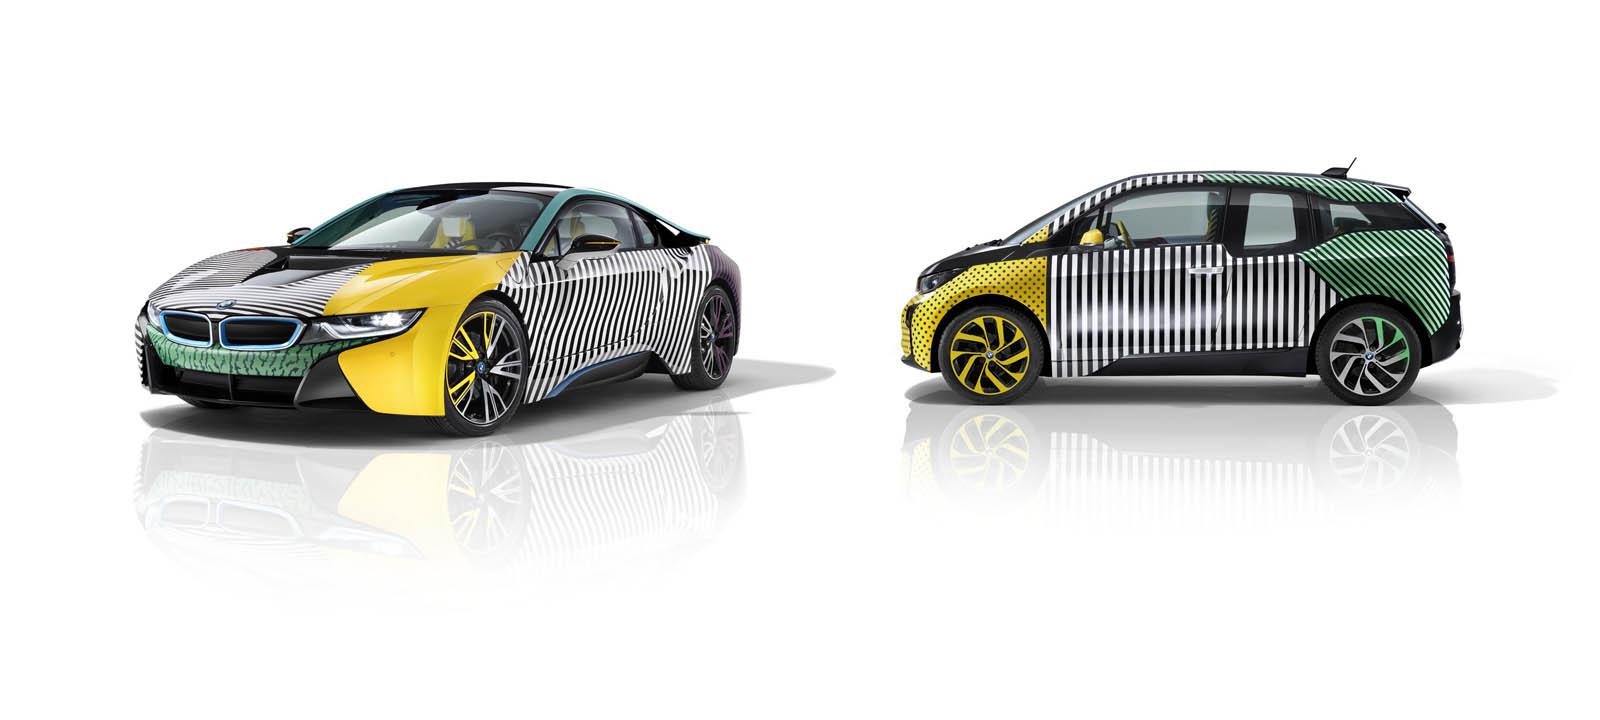 BMW i3 and i8 by Garage Italia Customs (19)